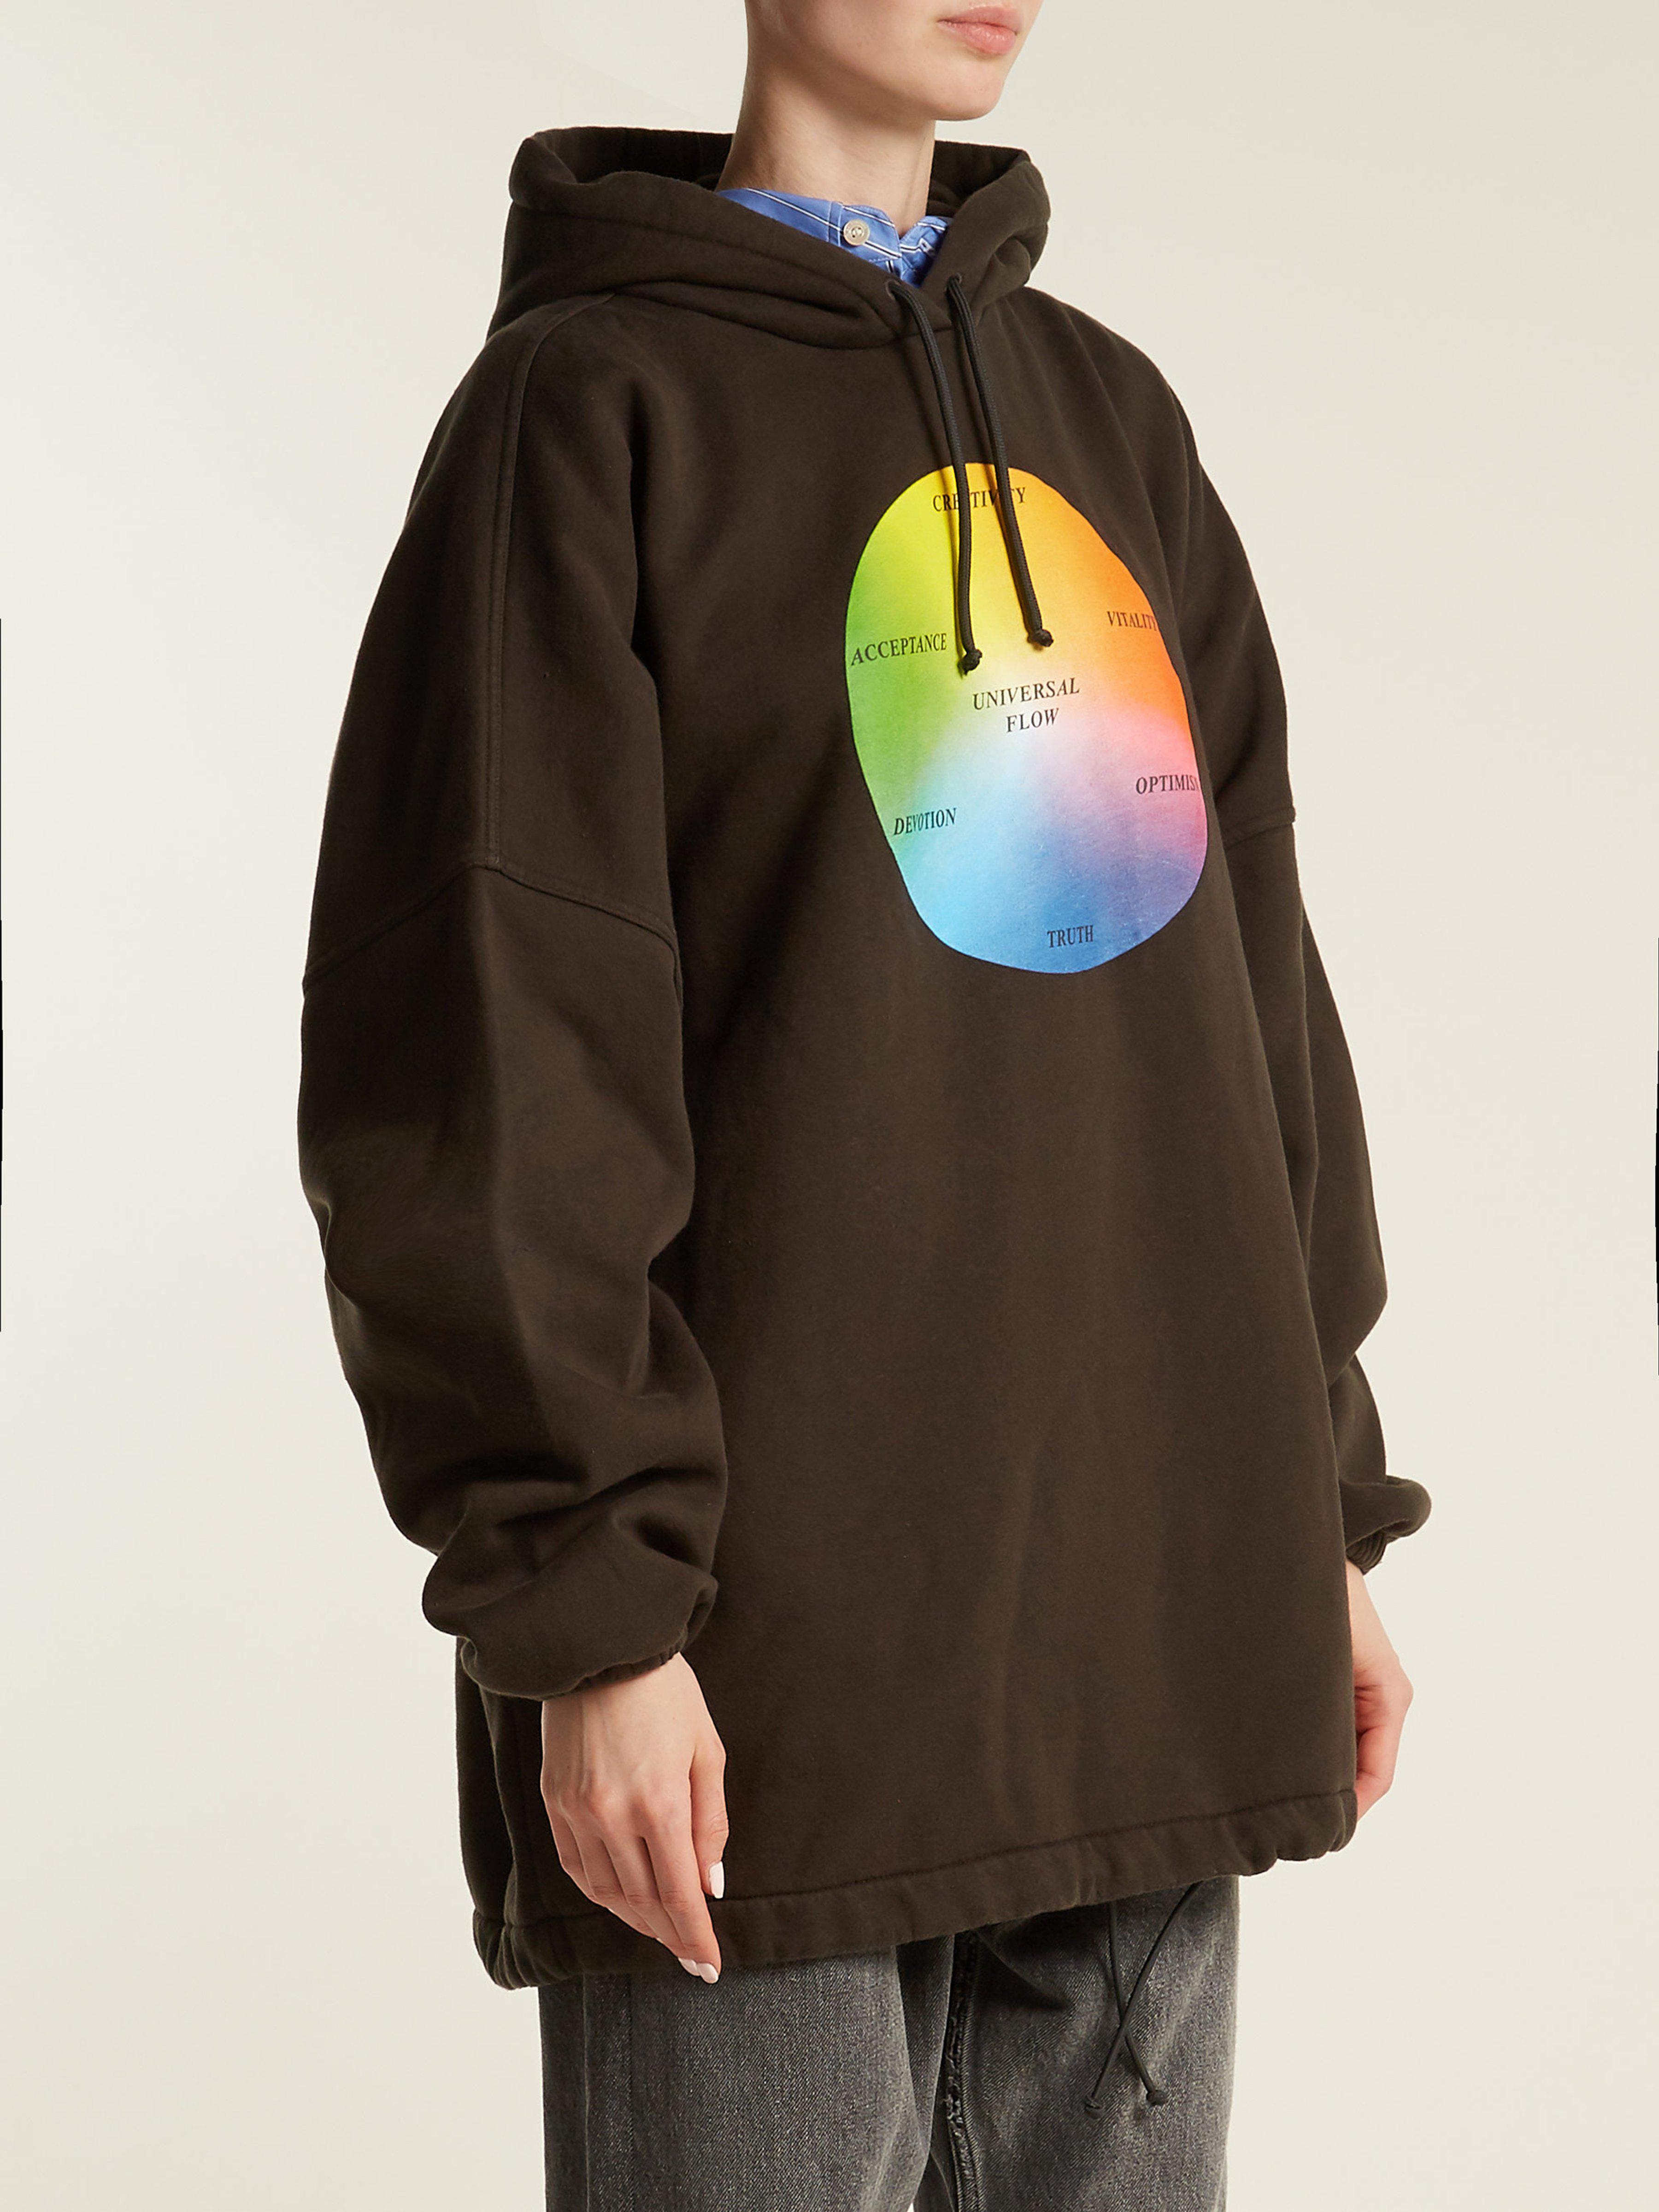 9eb6ce5ac Balenciaga Universal Flow Cotton Jersey Hooded Sweatshirt in Black - Lyst